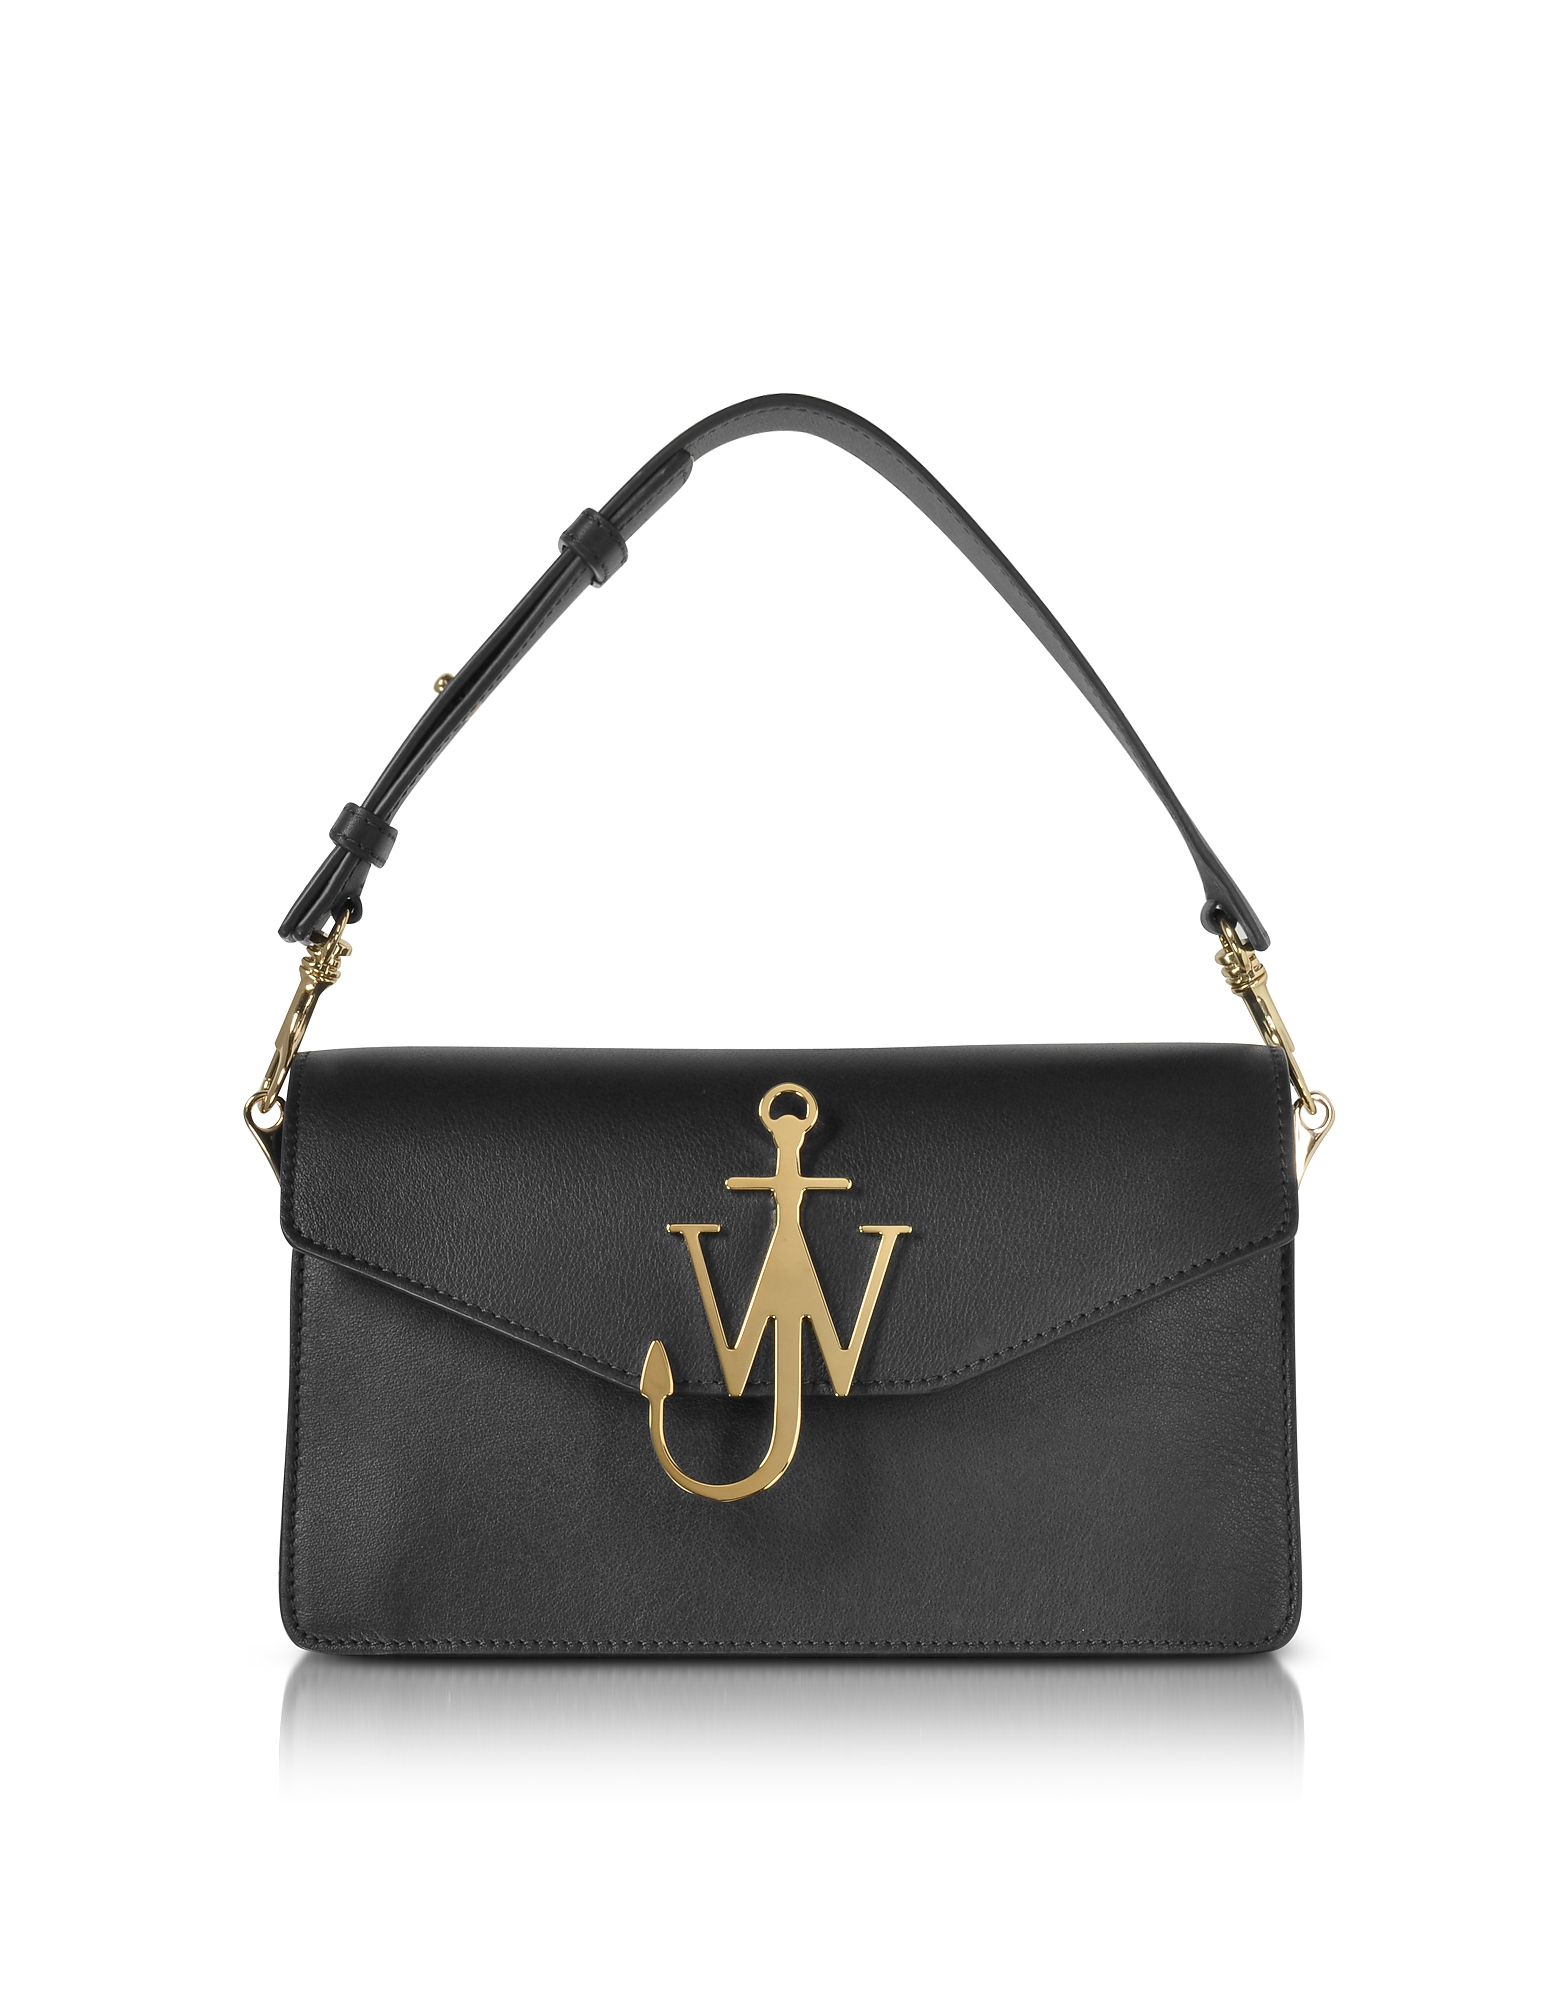 JW Anderson Handbags, Black Logo Purse